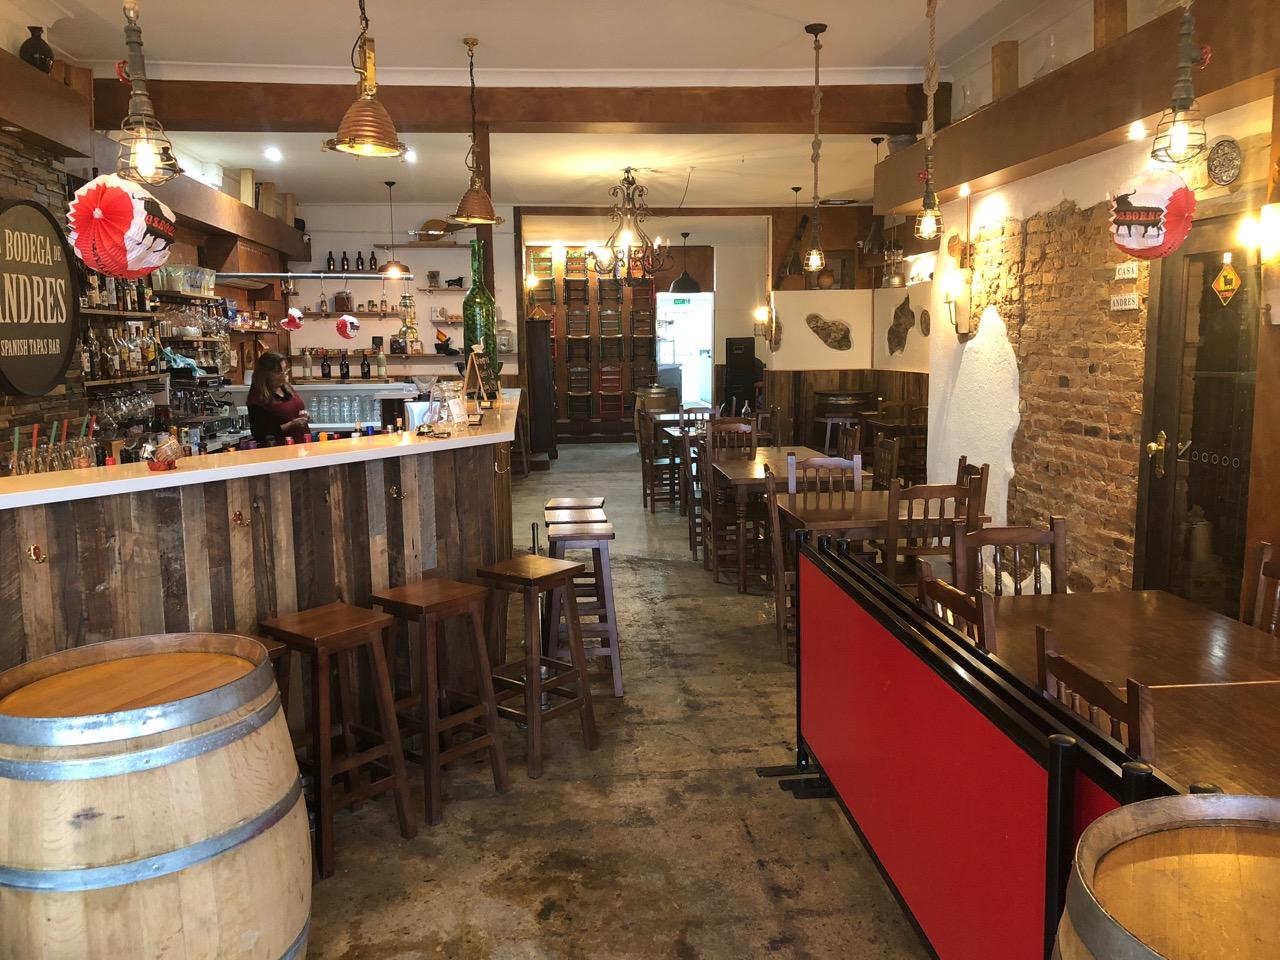 Spanish Tapas Restaurant Business For Sale